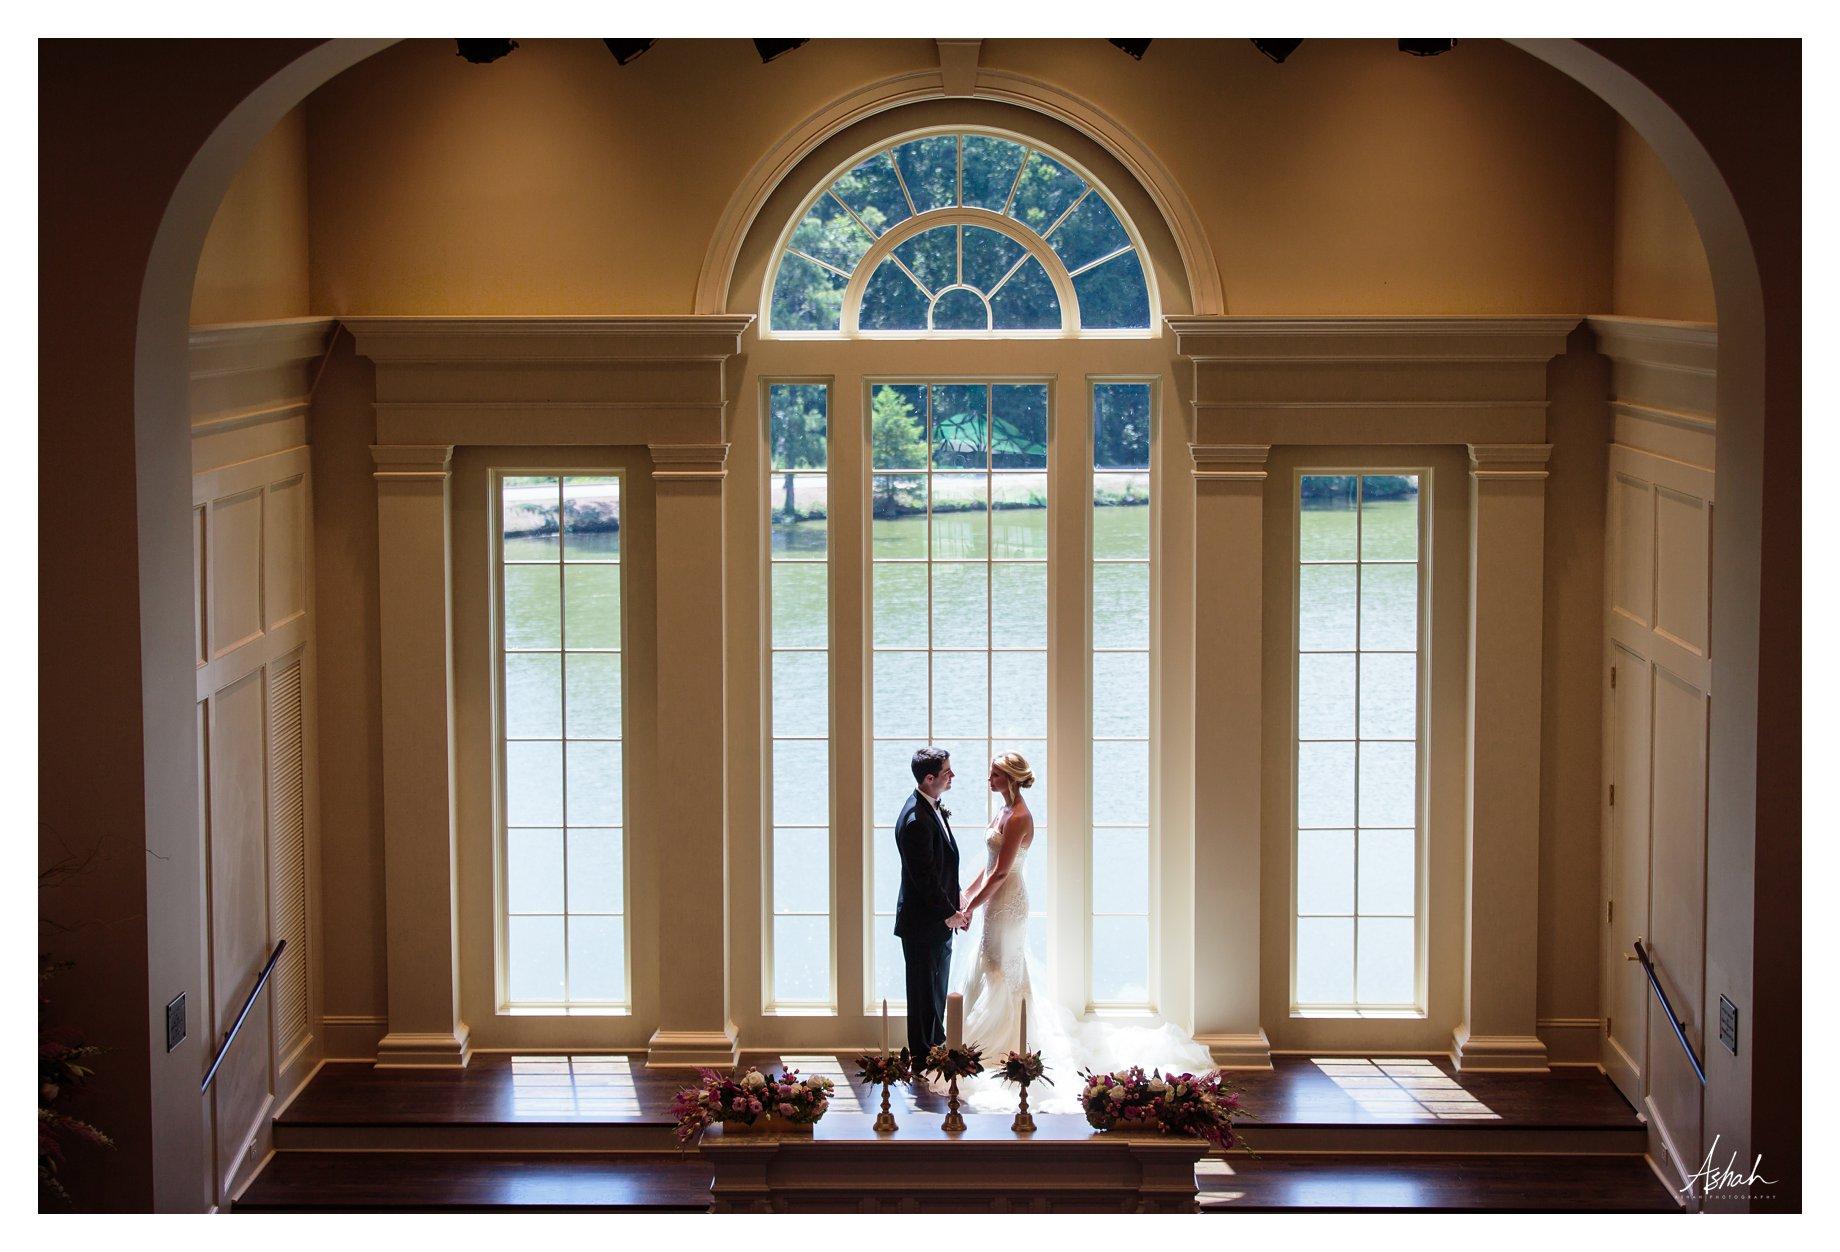 the Promise - Macon Wedding Photographer